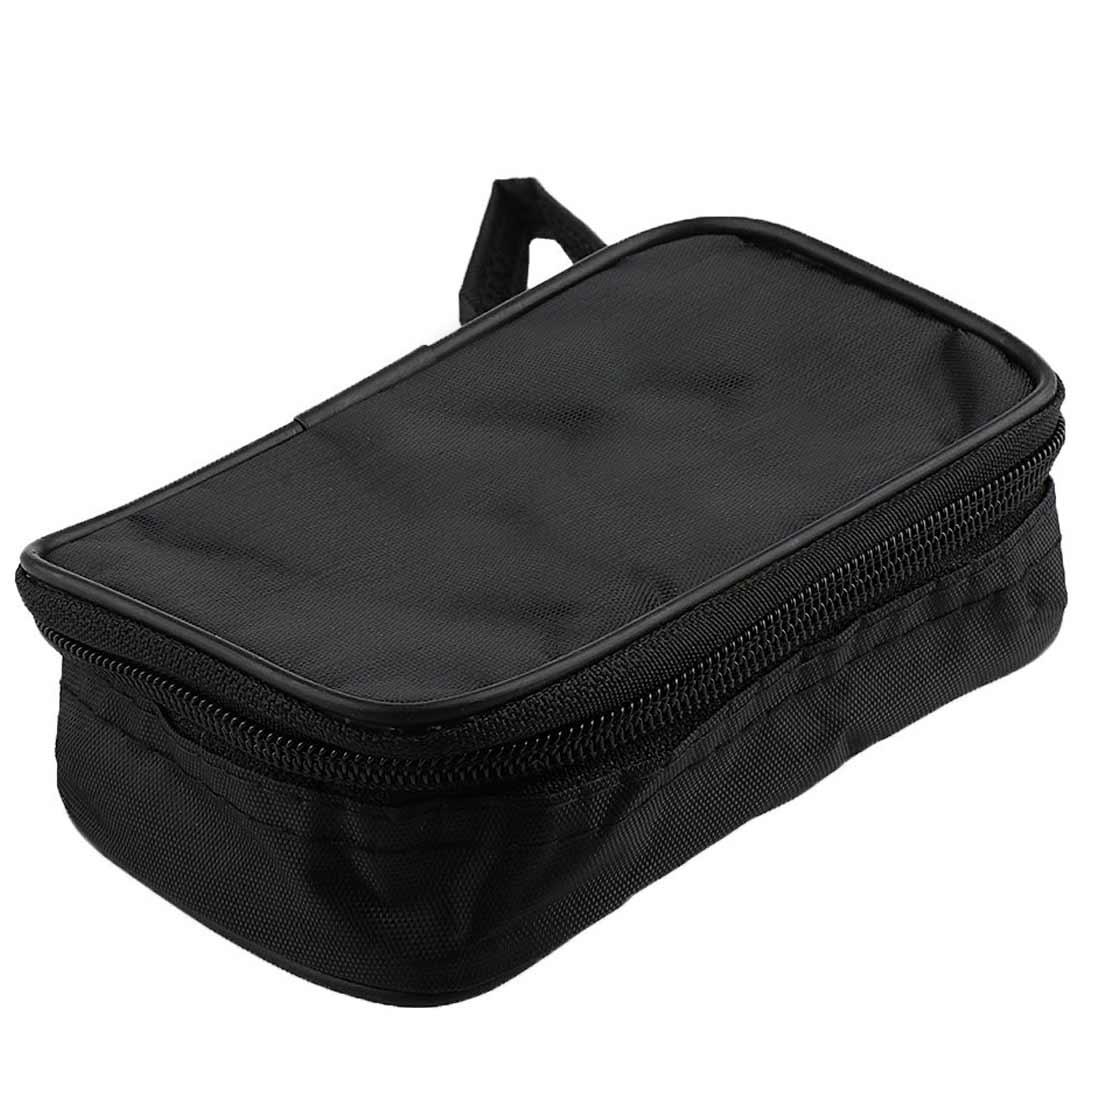 Canvas Case Multimeter Black Bag Durable Waterproof Shockproof Soft Case Tool Bag Instrument Storage Bag 23x14x5cm